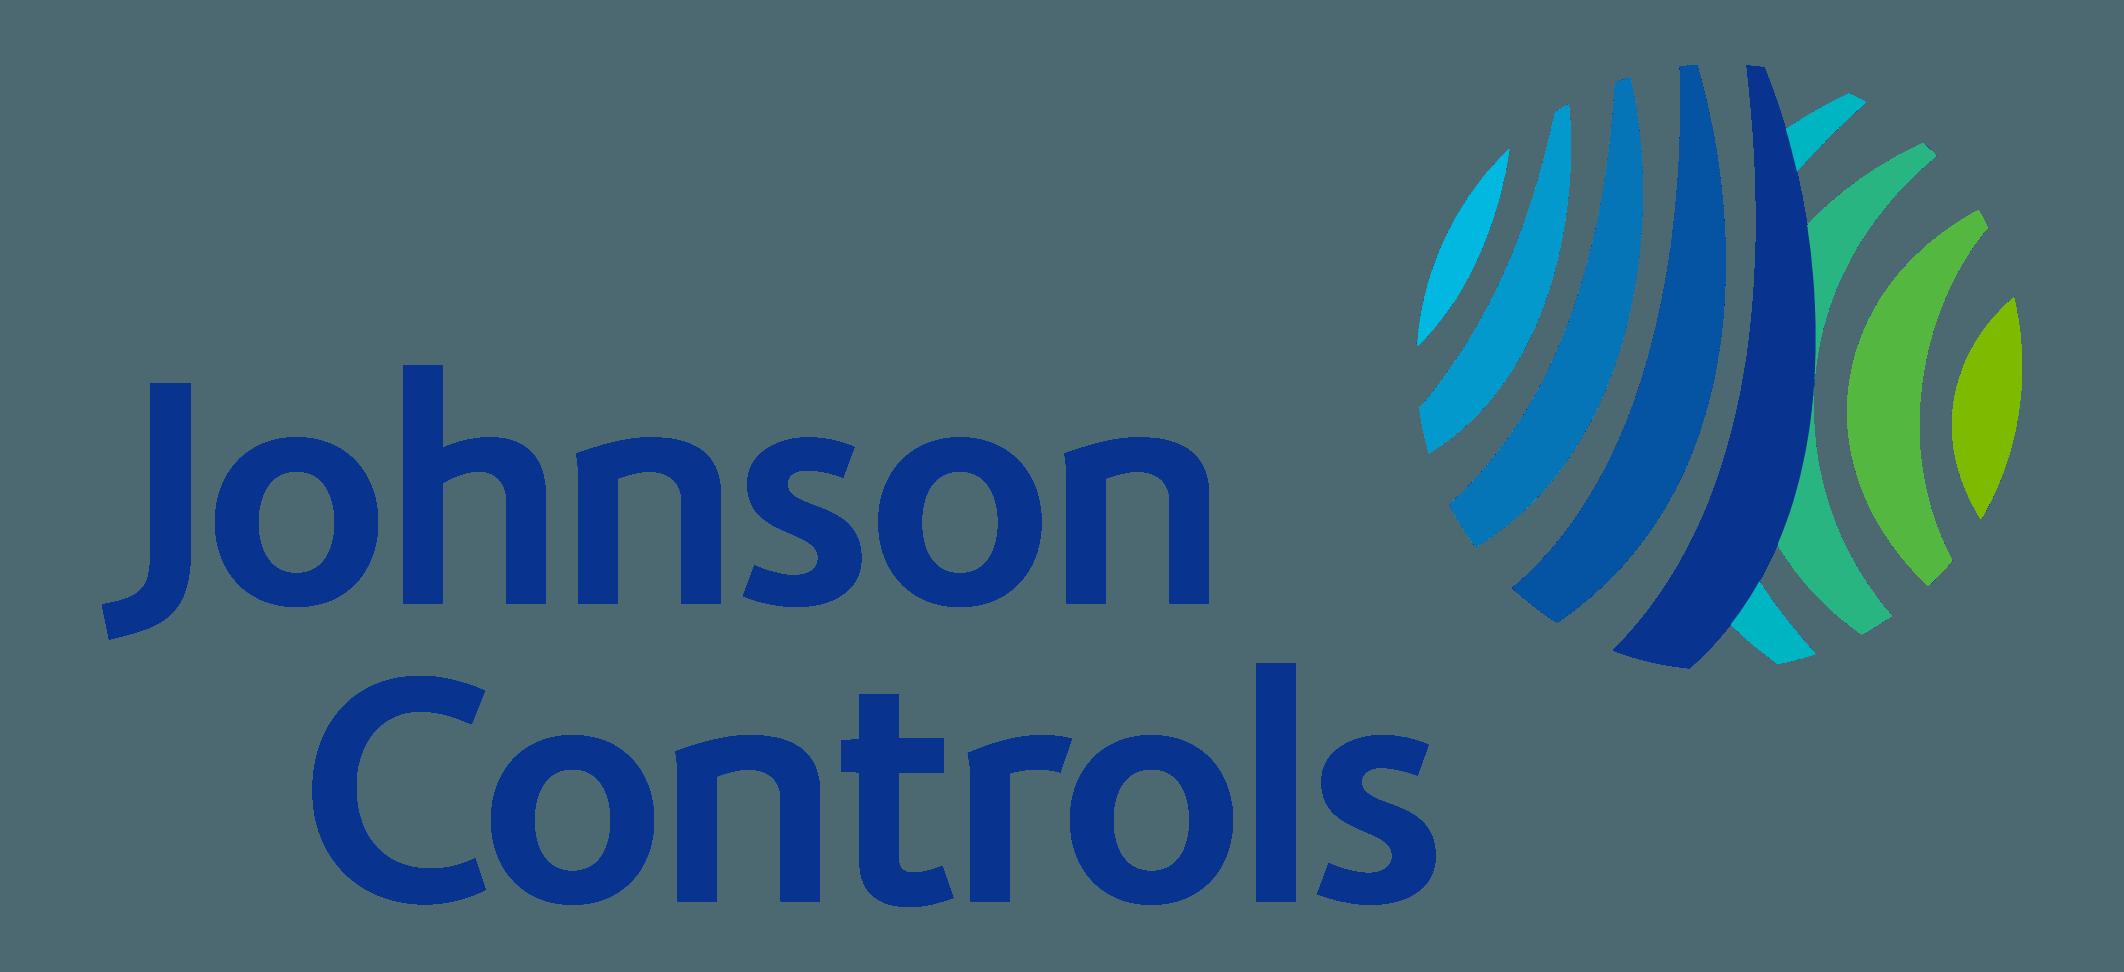 Johnson Controls Mass Notification Solutions logo